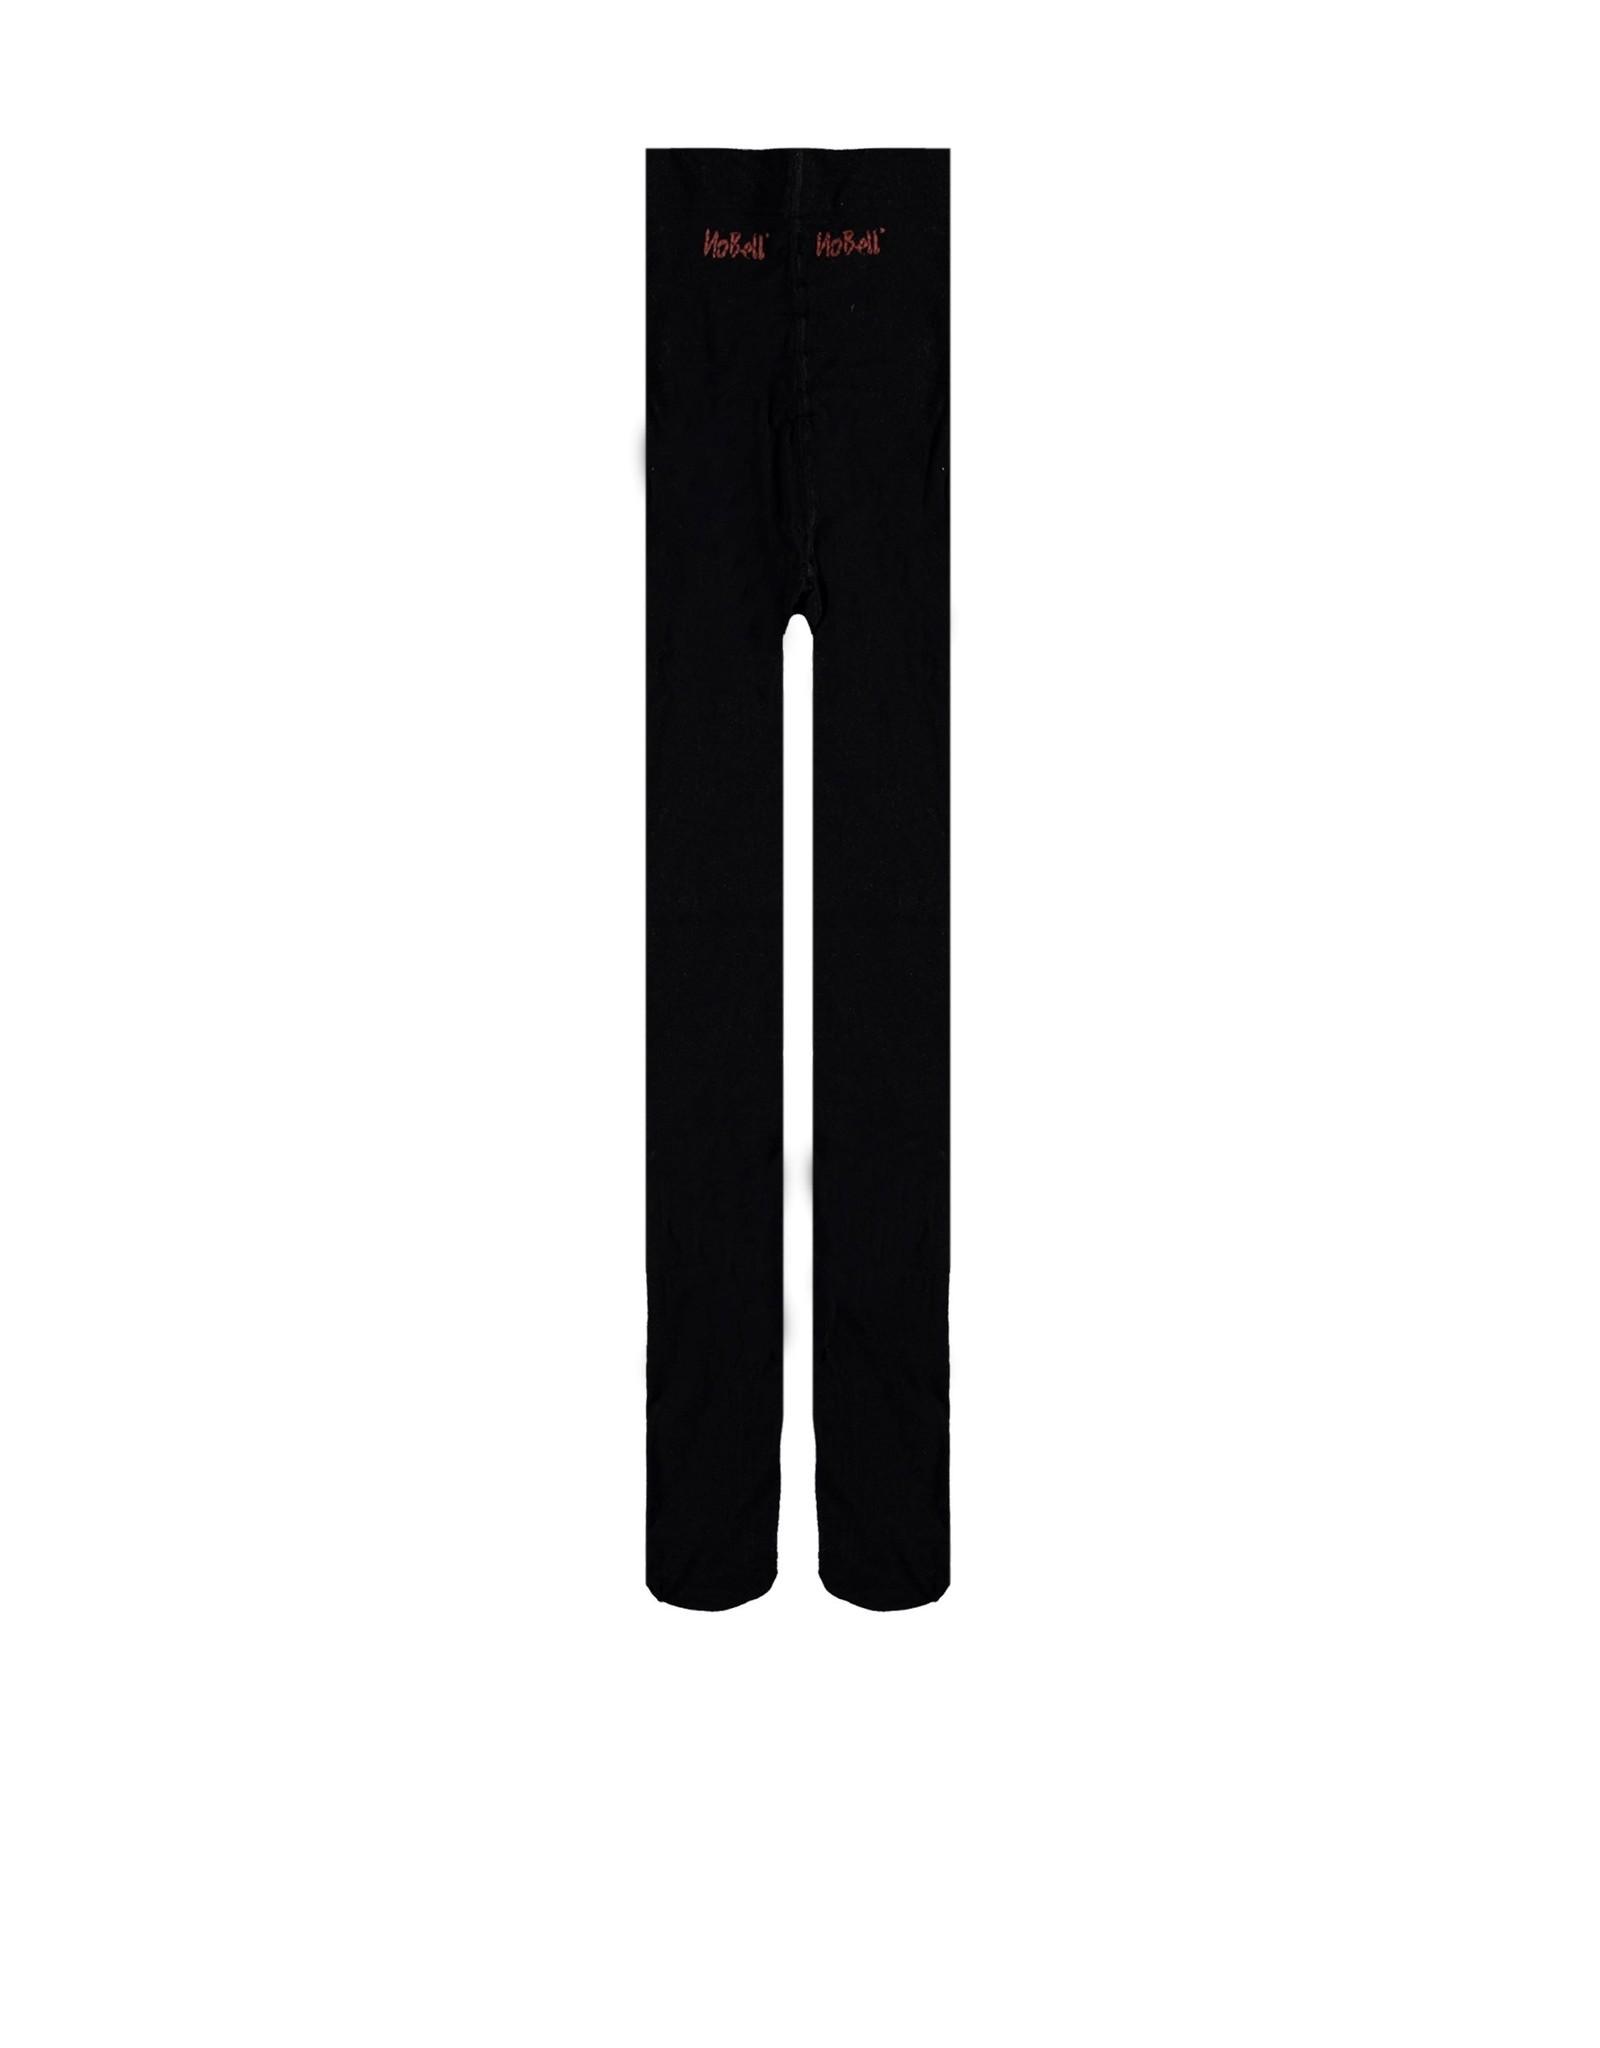 NoBell panty 3905 jet black